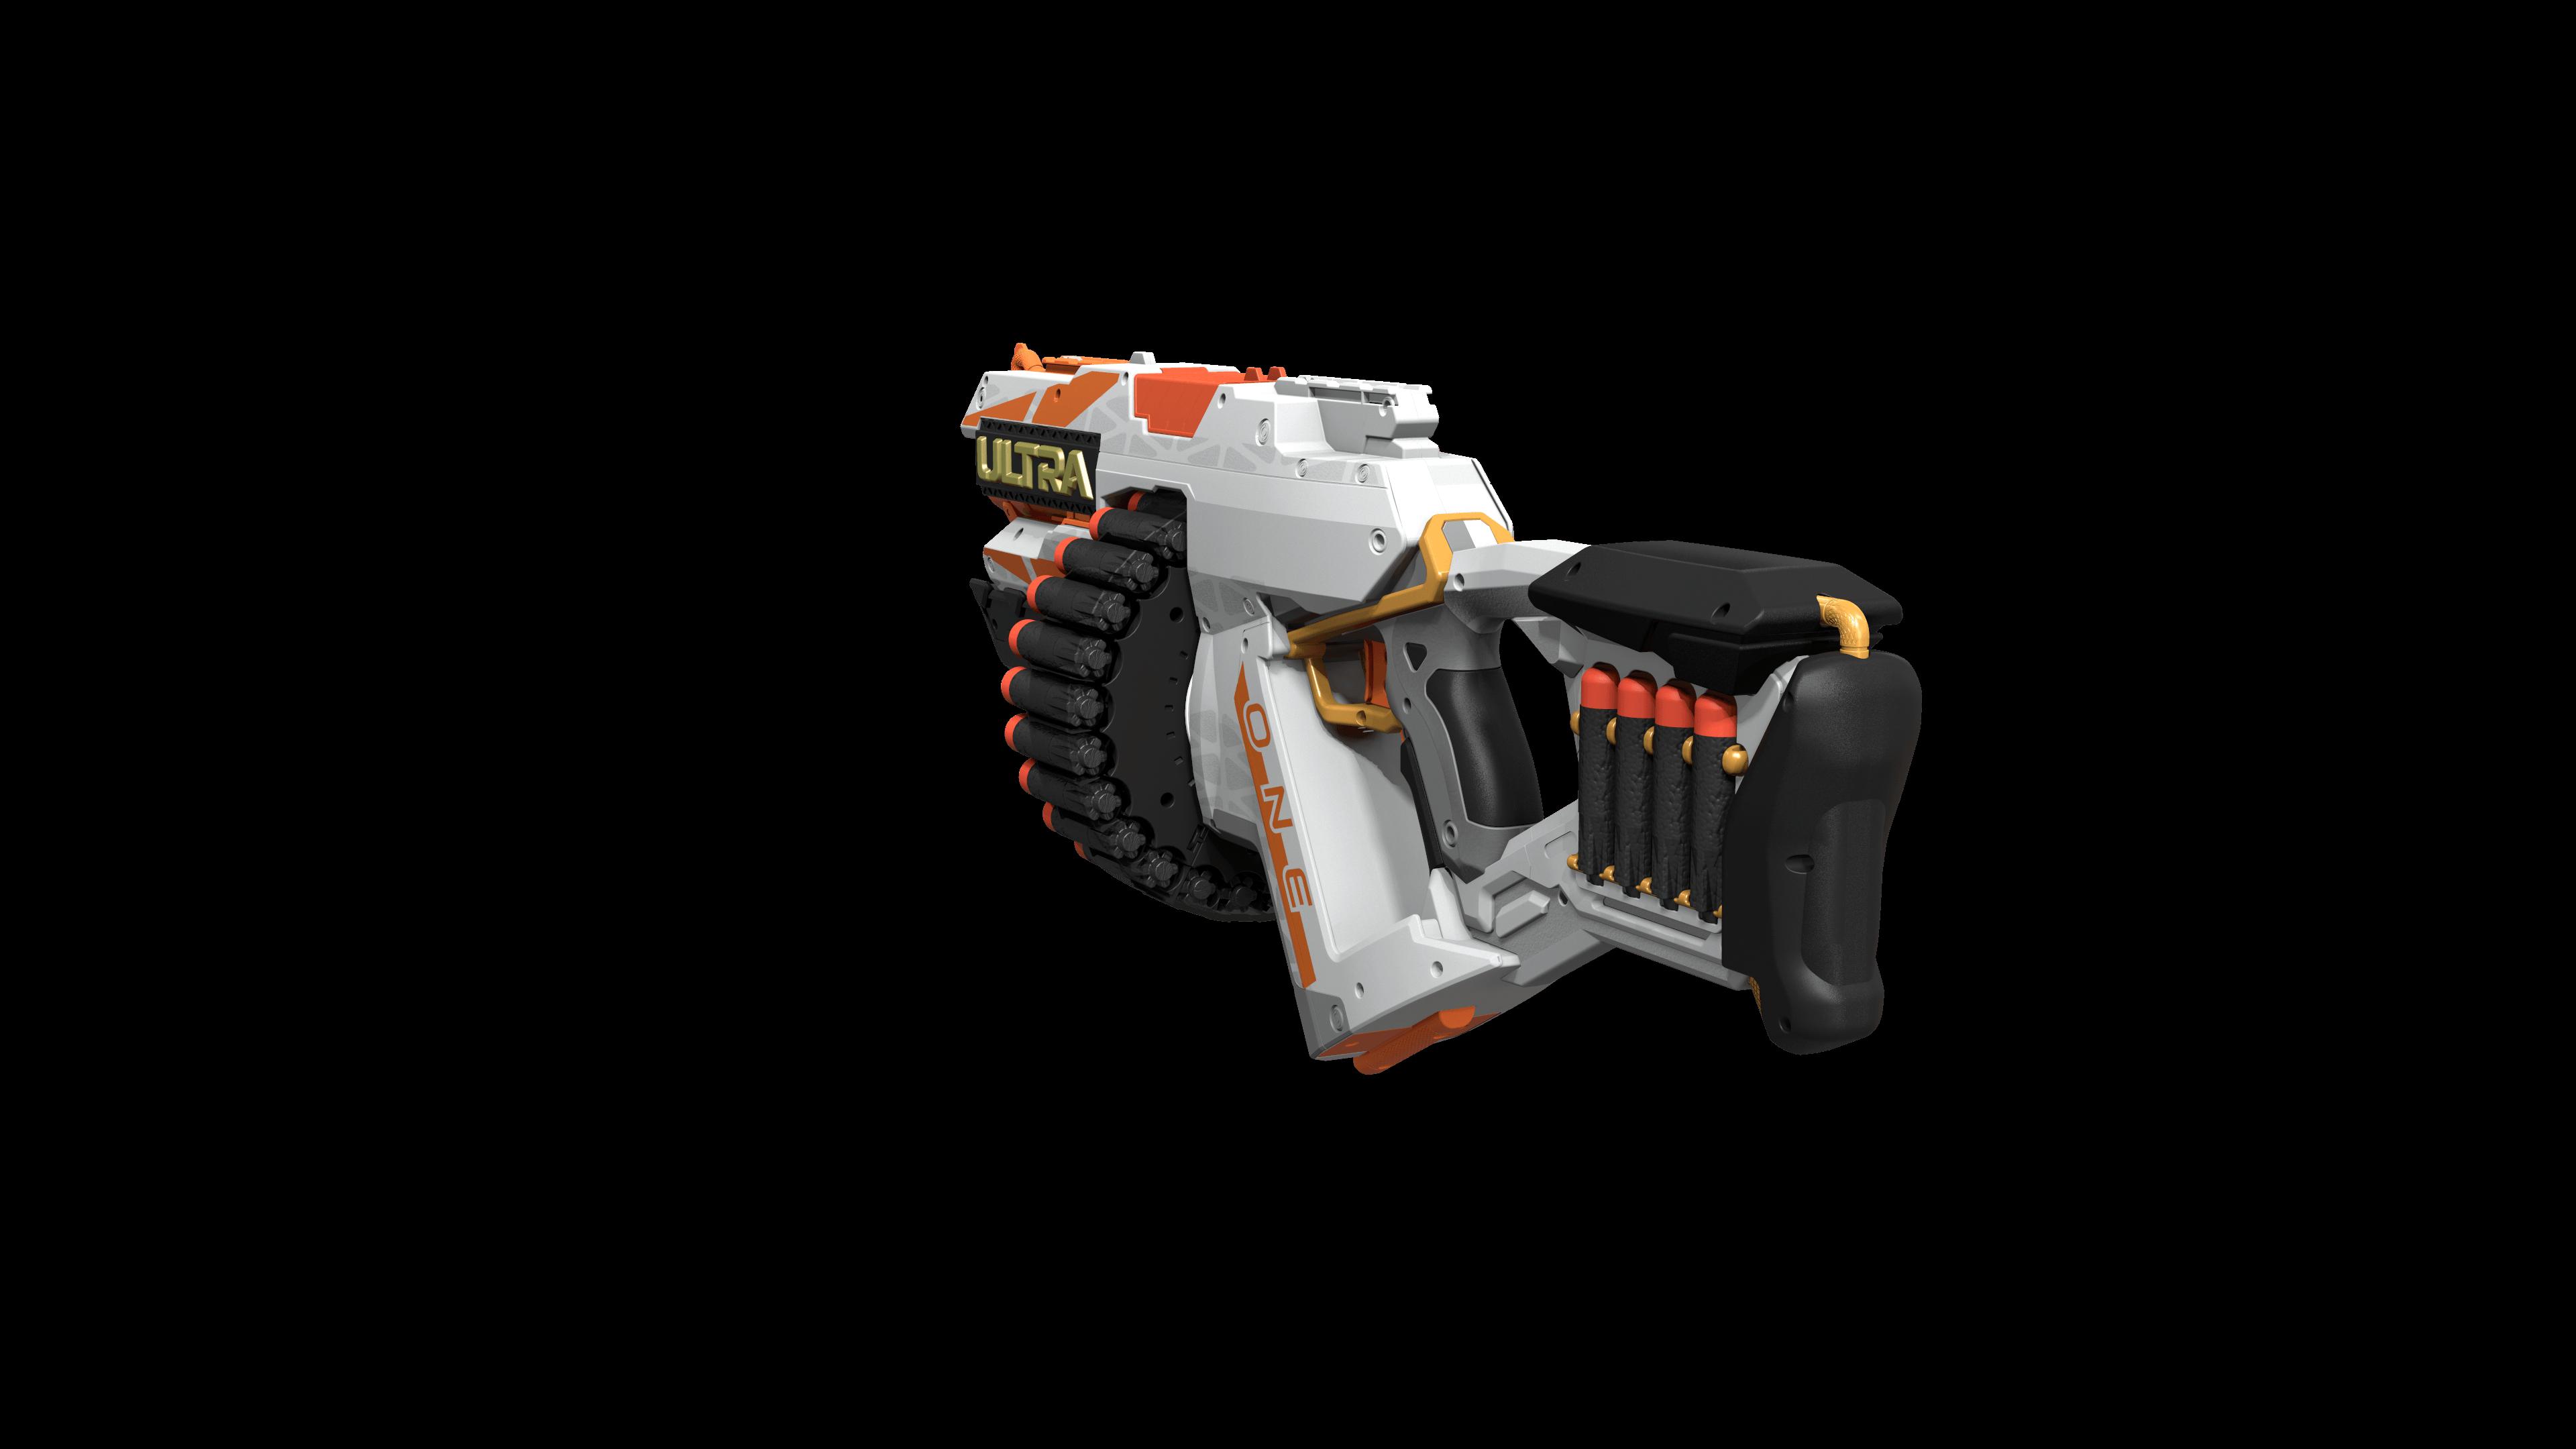 ultra blaster img 42